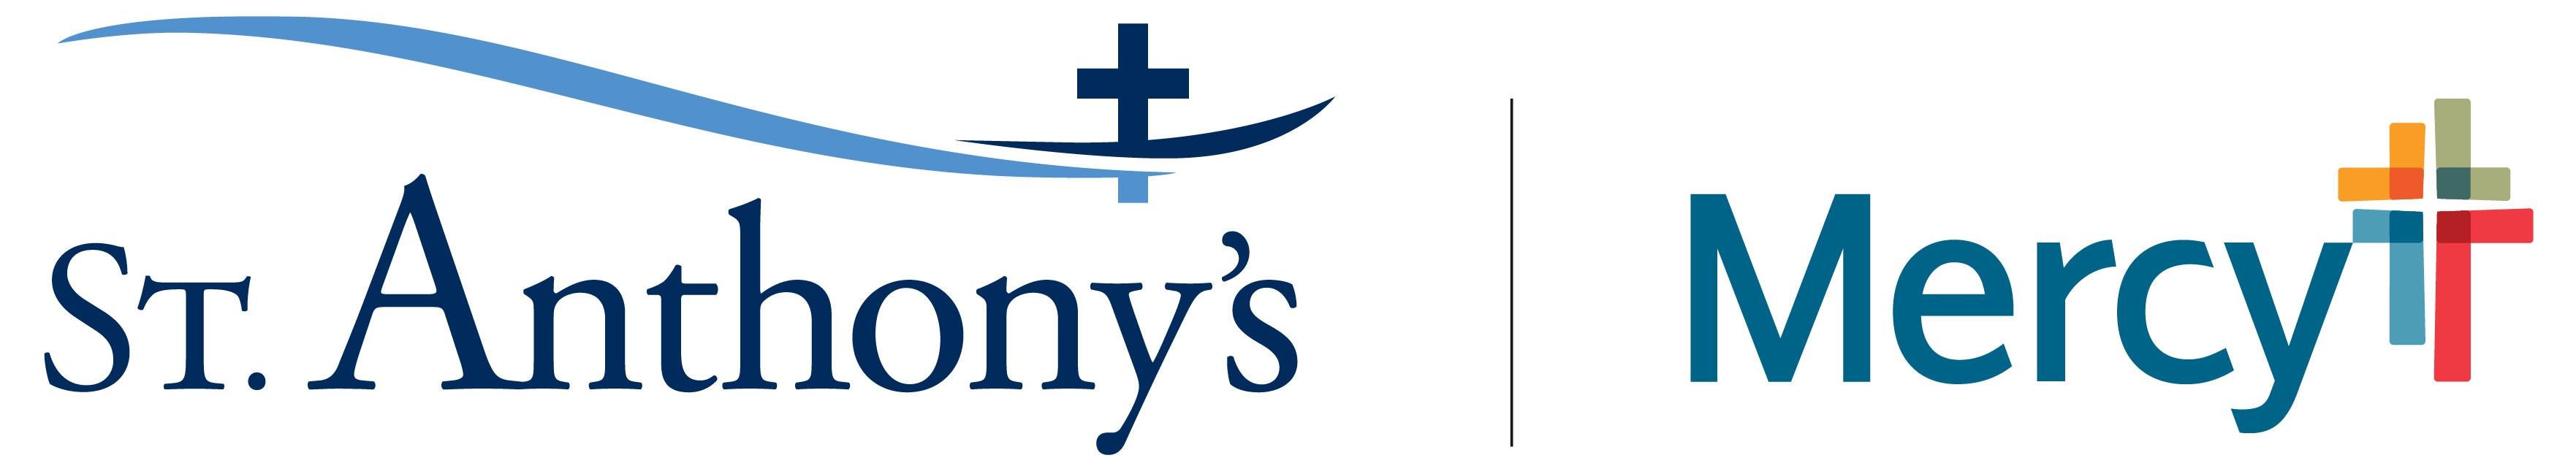 MINK - banner ad - St Anthonys - Mercy.jpg